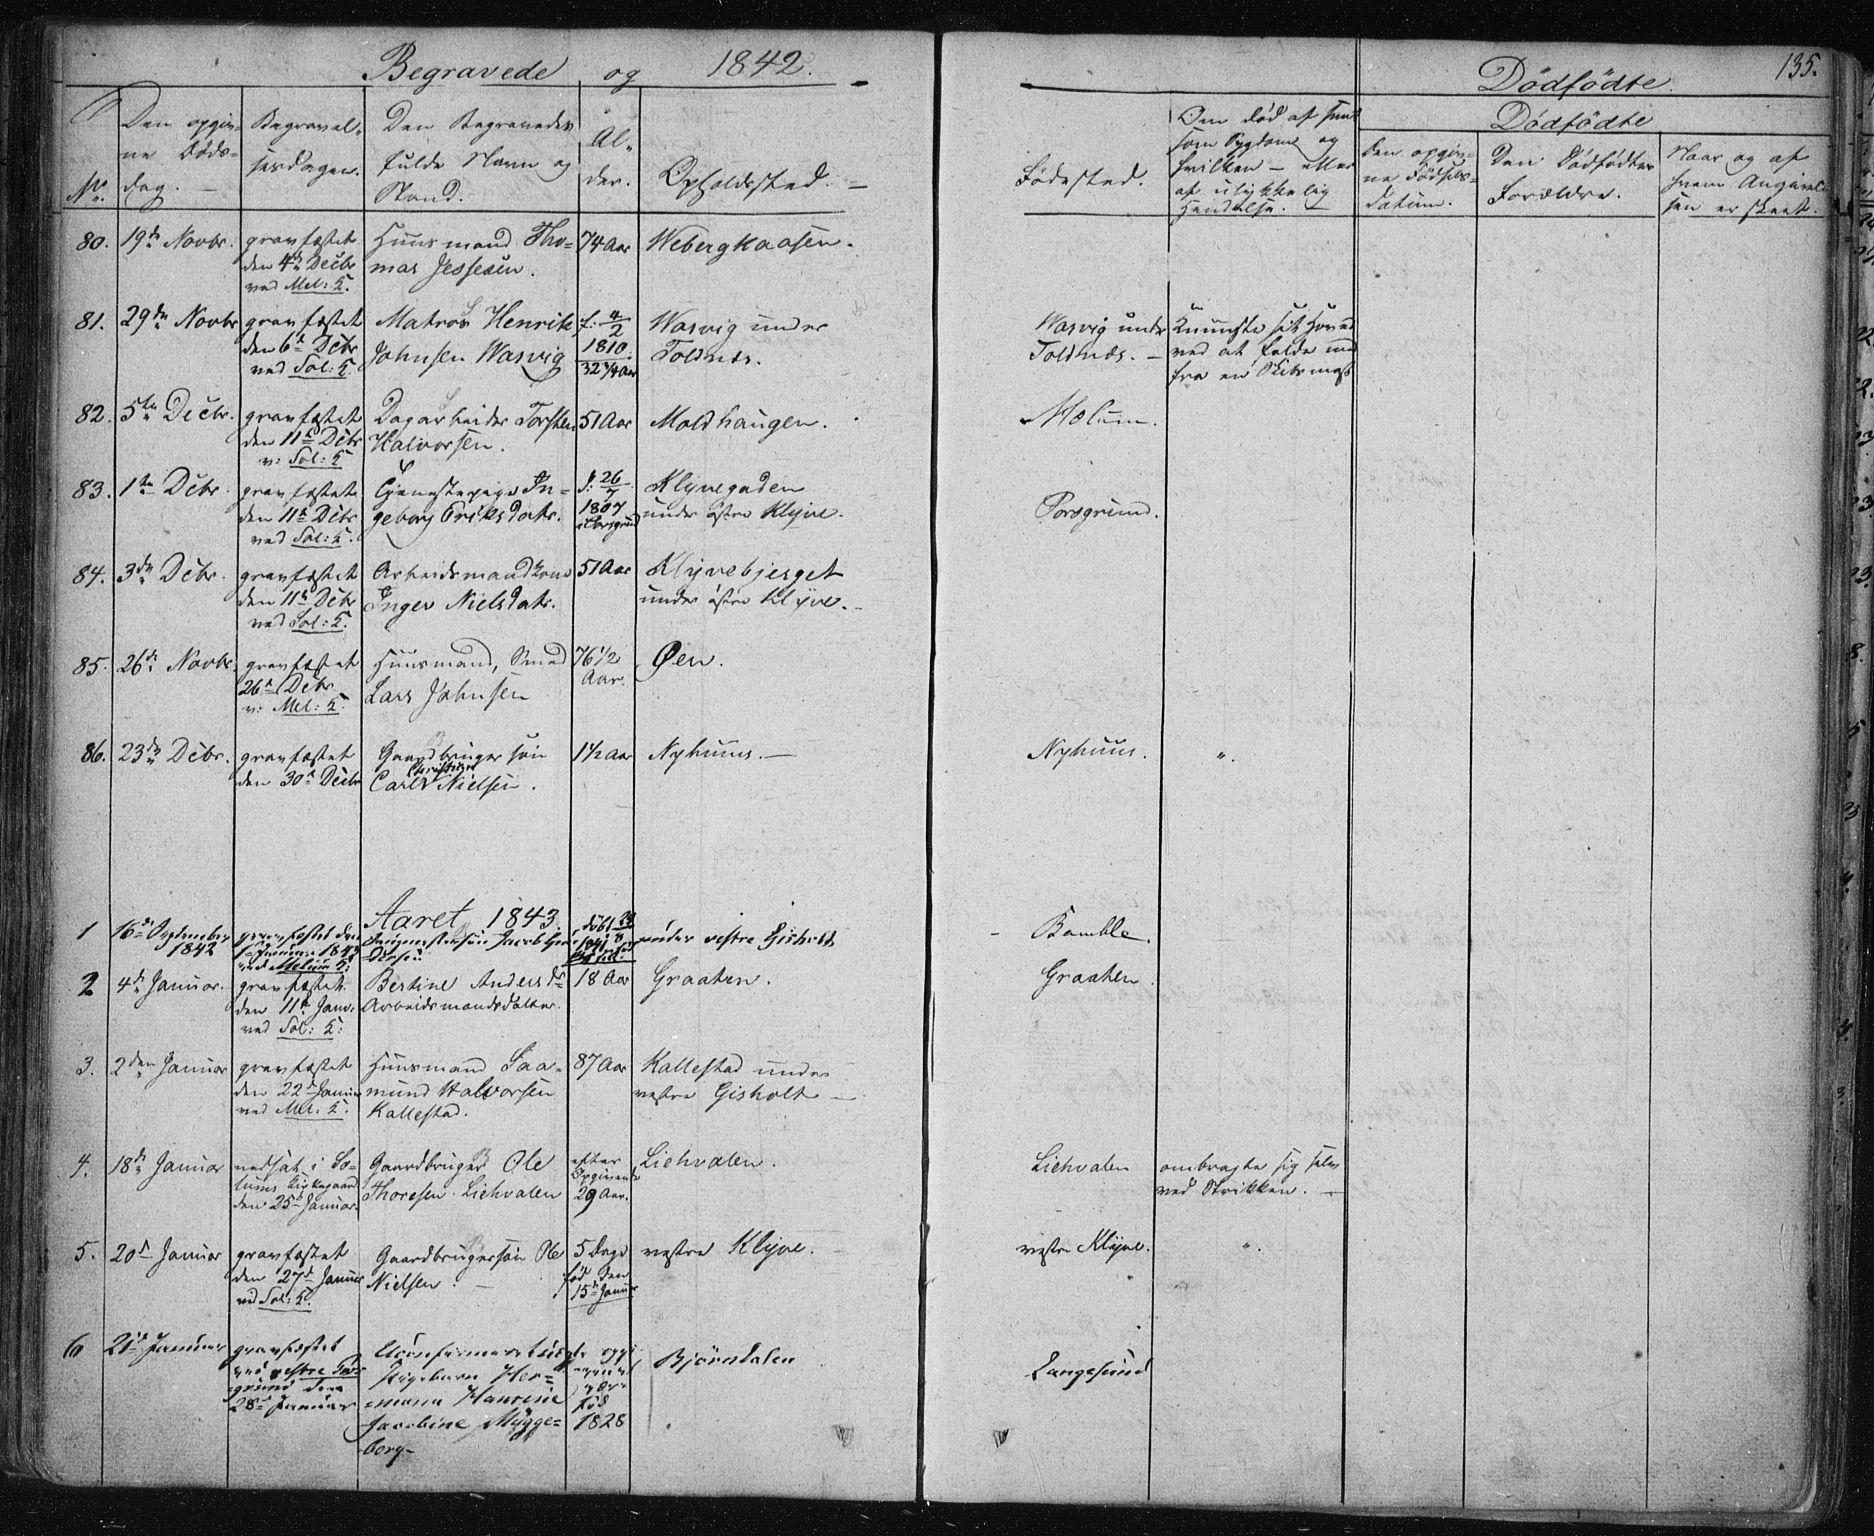 SAKO, Solum kirkebøker, F/Fa/L0005: Ministerialbok nr. I 5, 1833-1843, s. 135